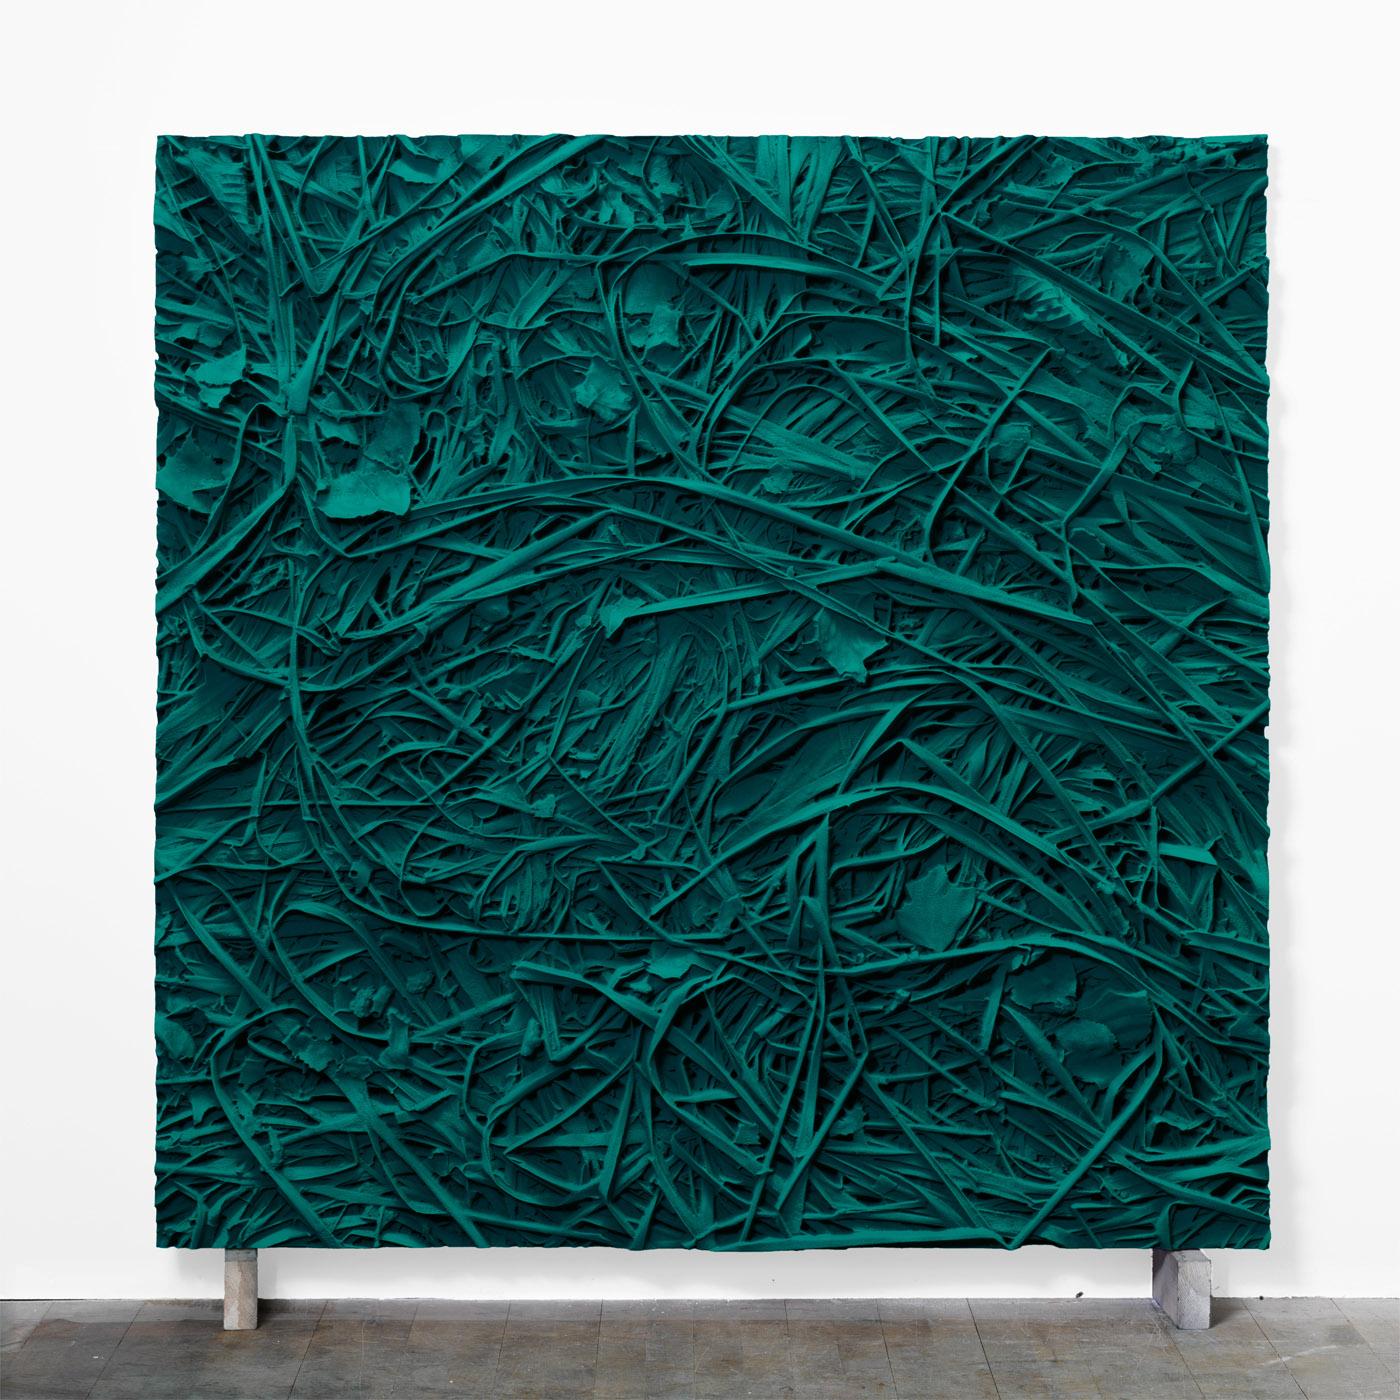 Juri Markkula, PG7 / 18 Grass, 2015, Pigmented polyvinyl on polyuretan relief, 150 x 150 x 11 cm